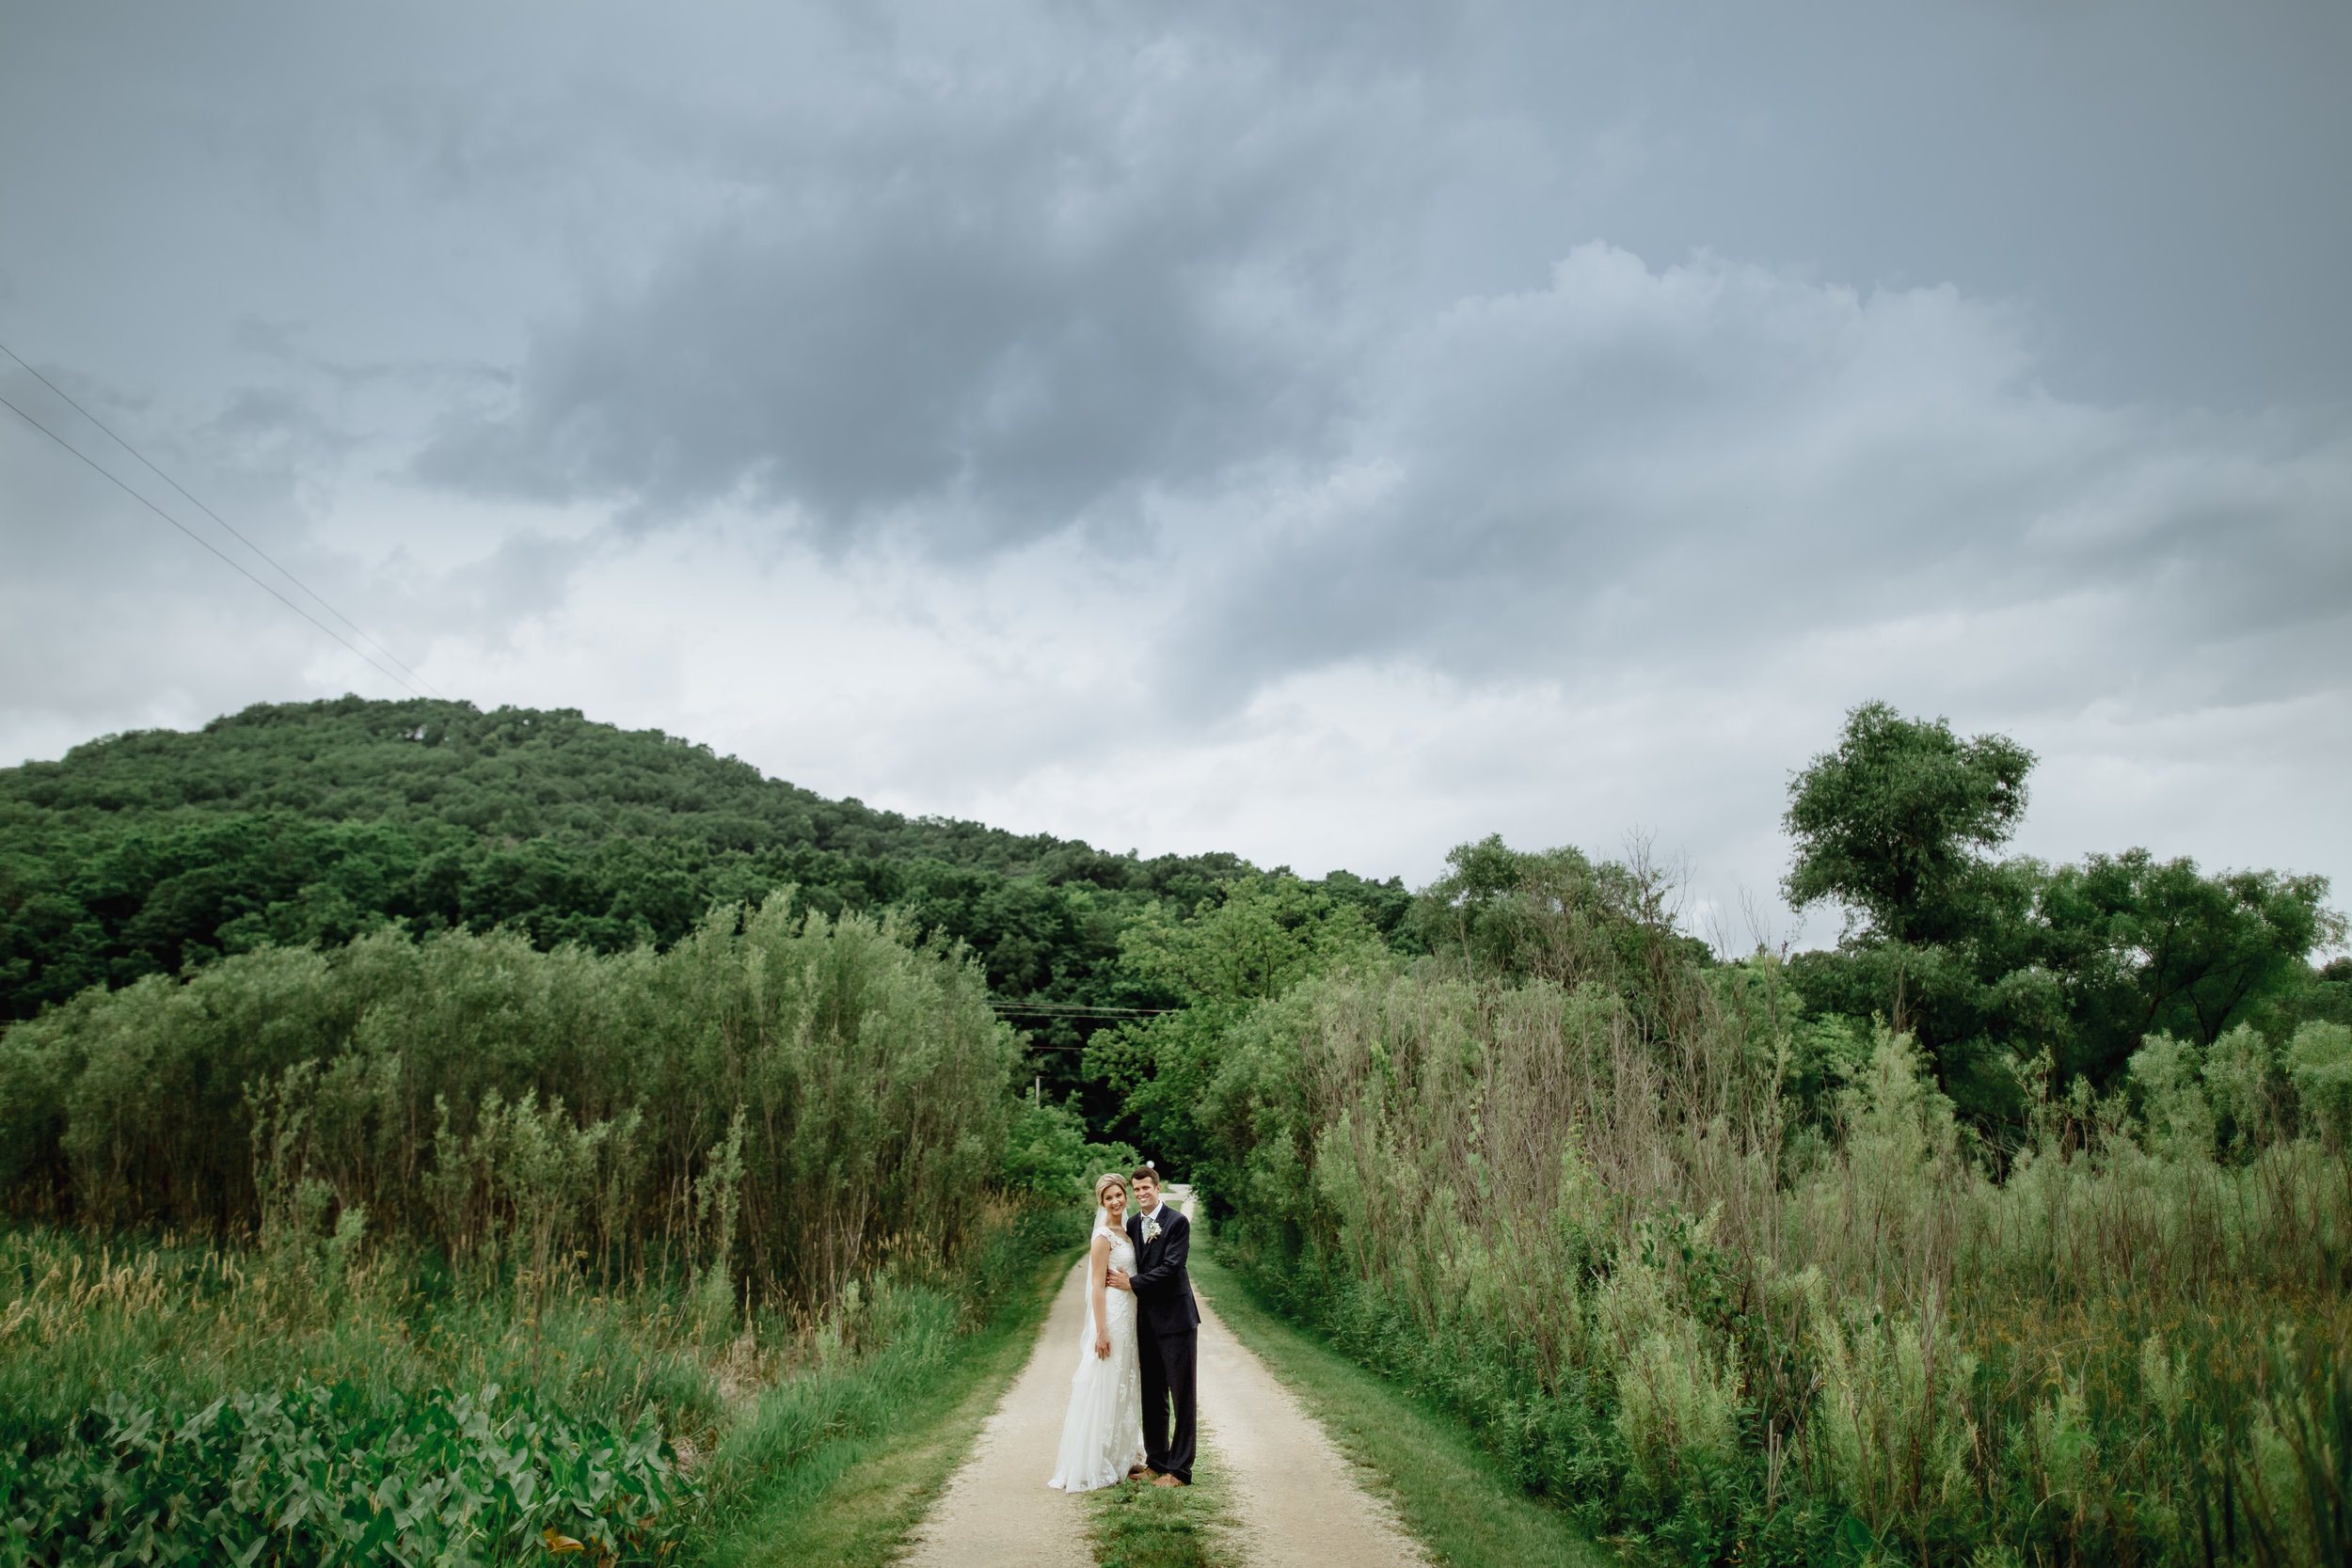 bride-groom-outdoor-wedding